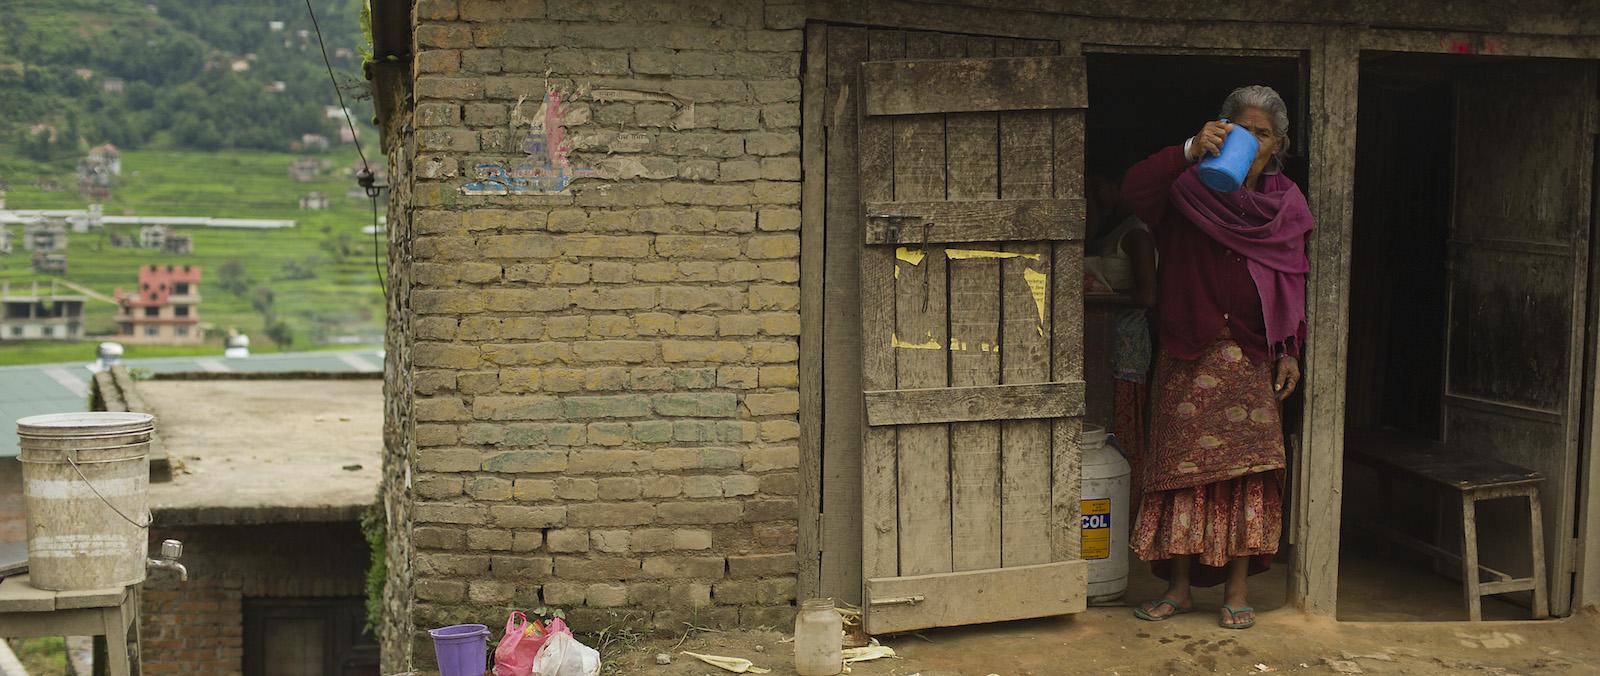 A Nepali woman in Kathmandu (Photo: PACAF/ Flickr)